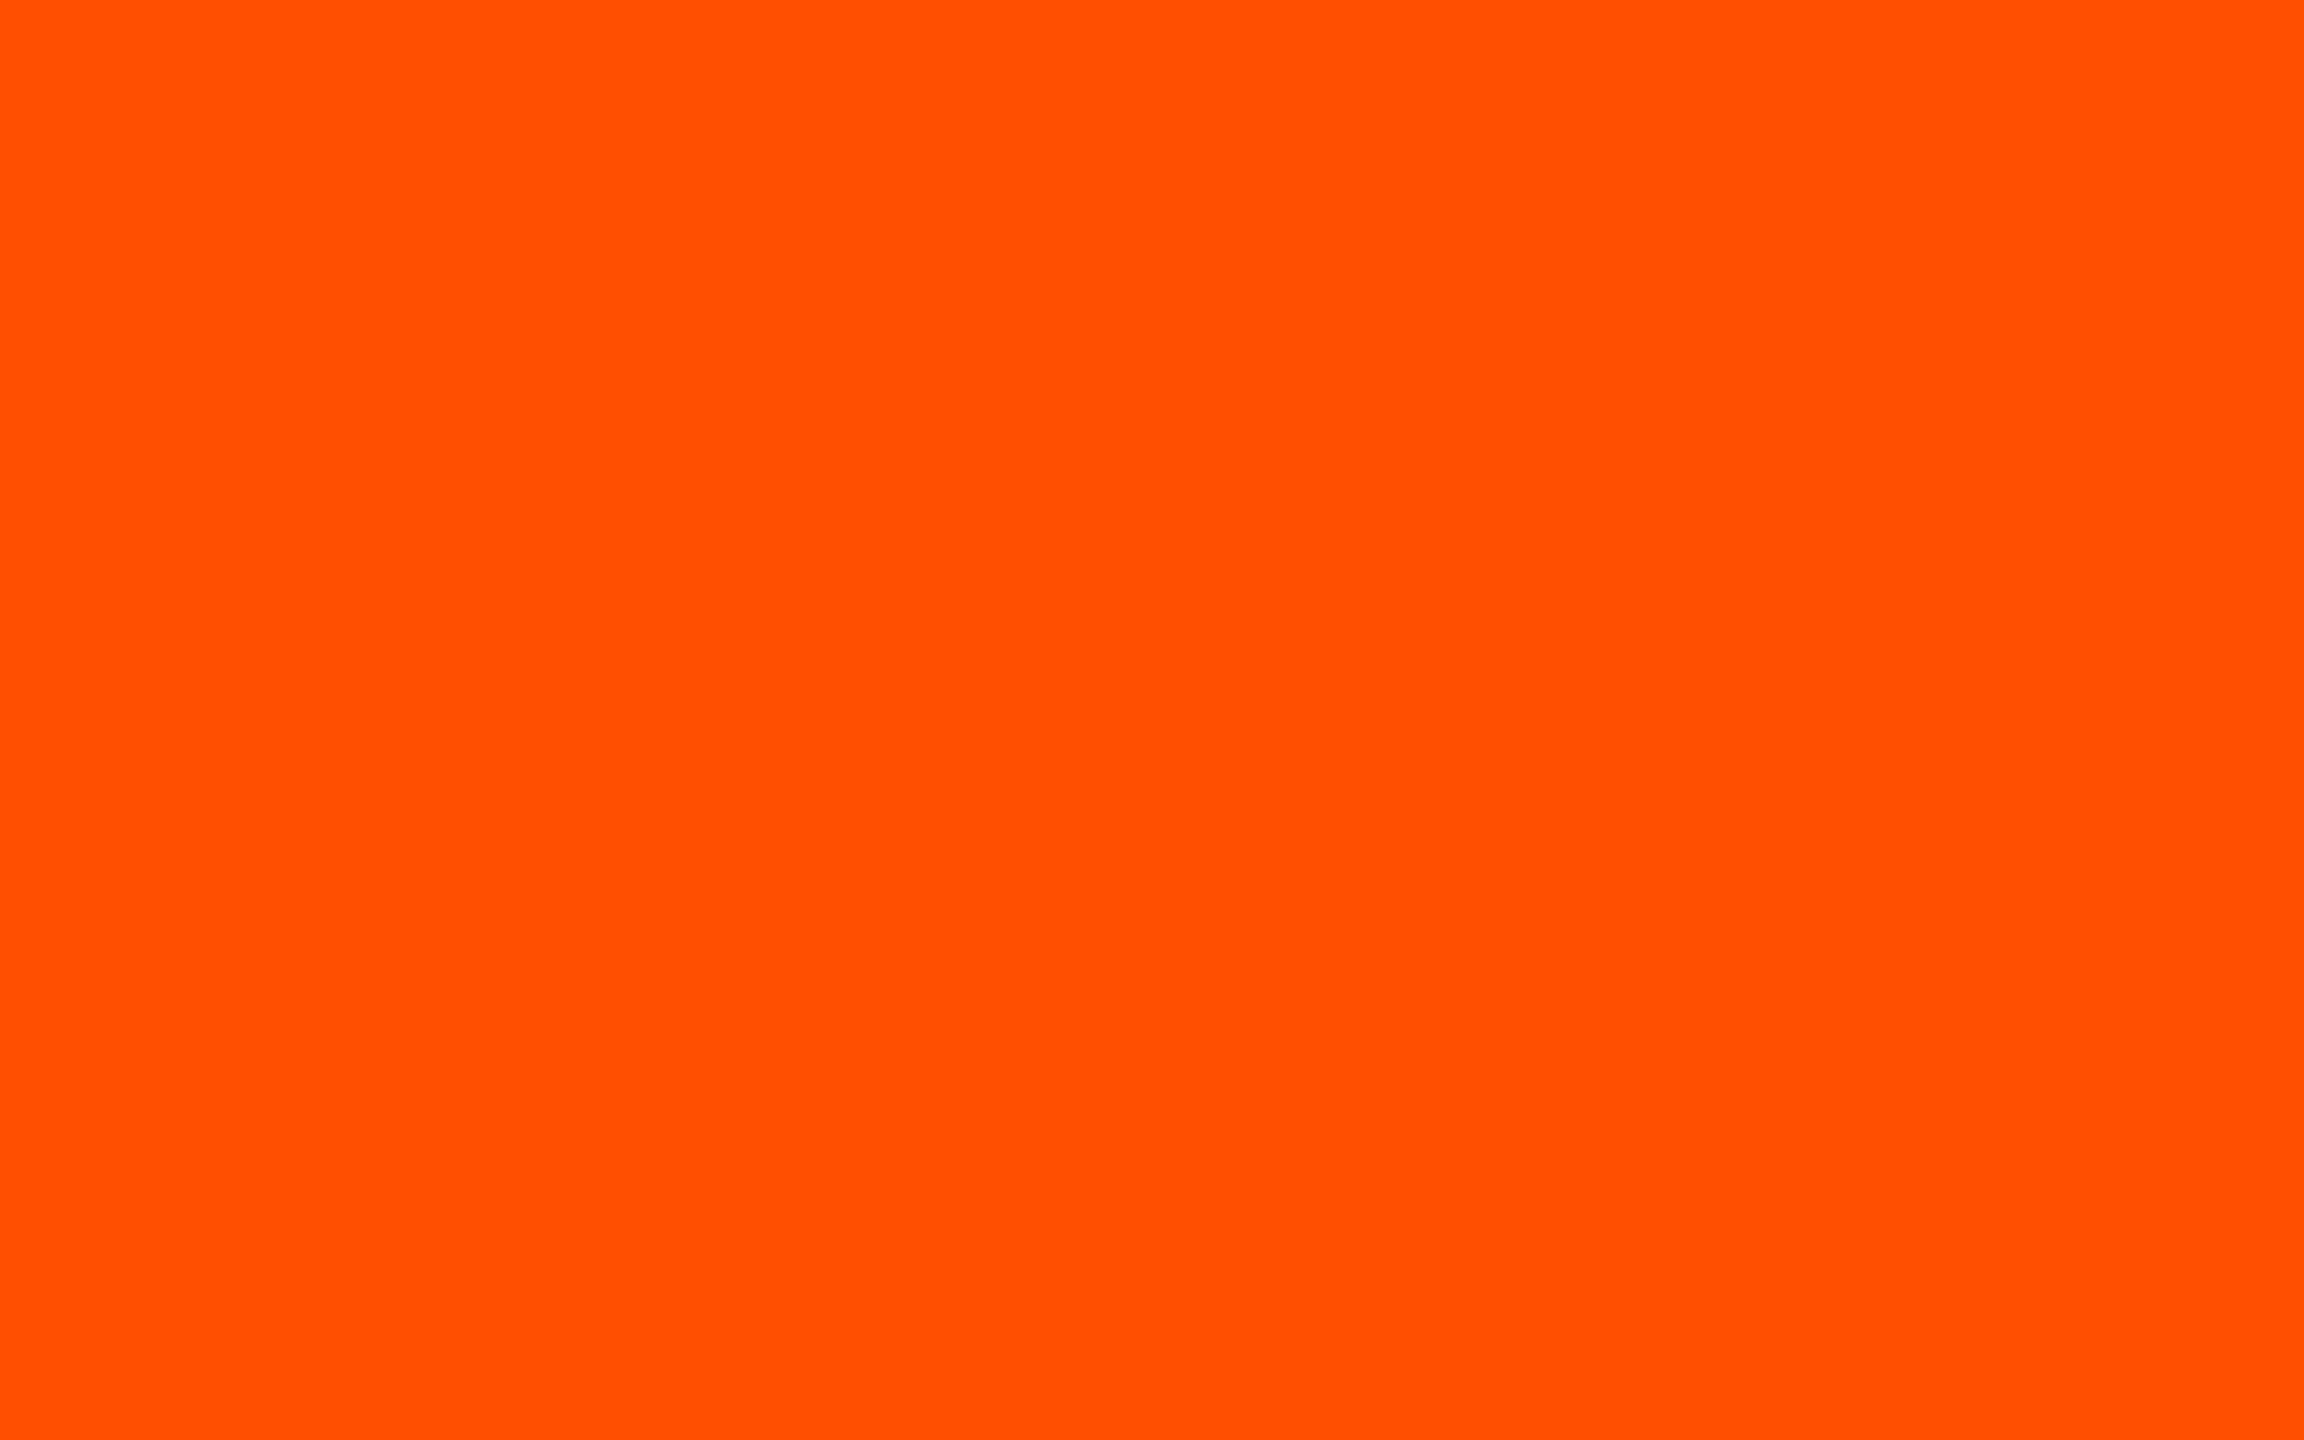 2304x1440 International Orange Aerospace Solid Color Background